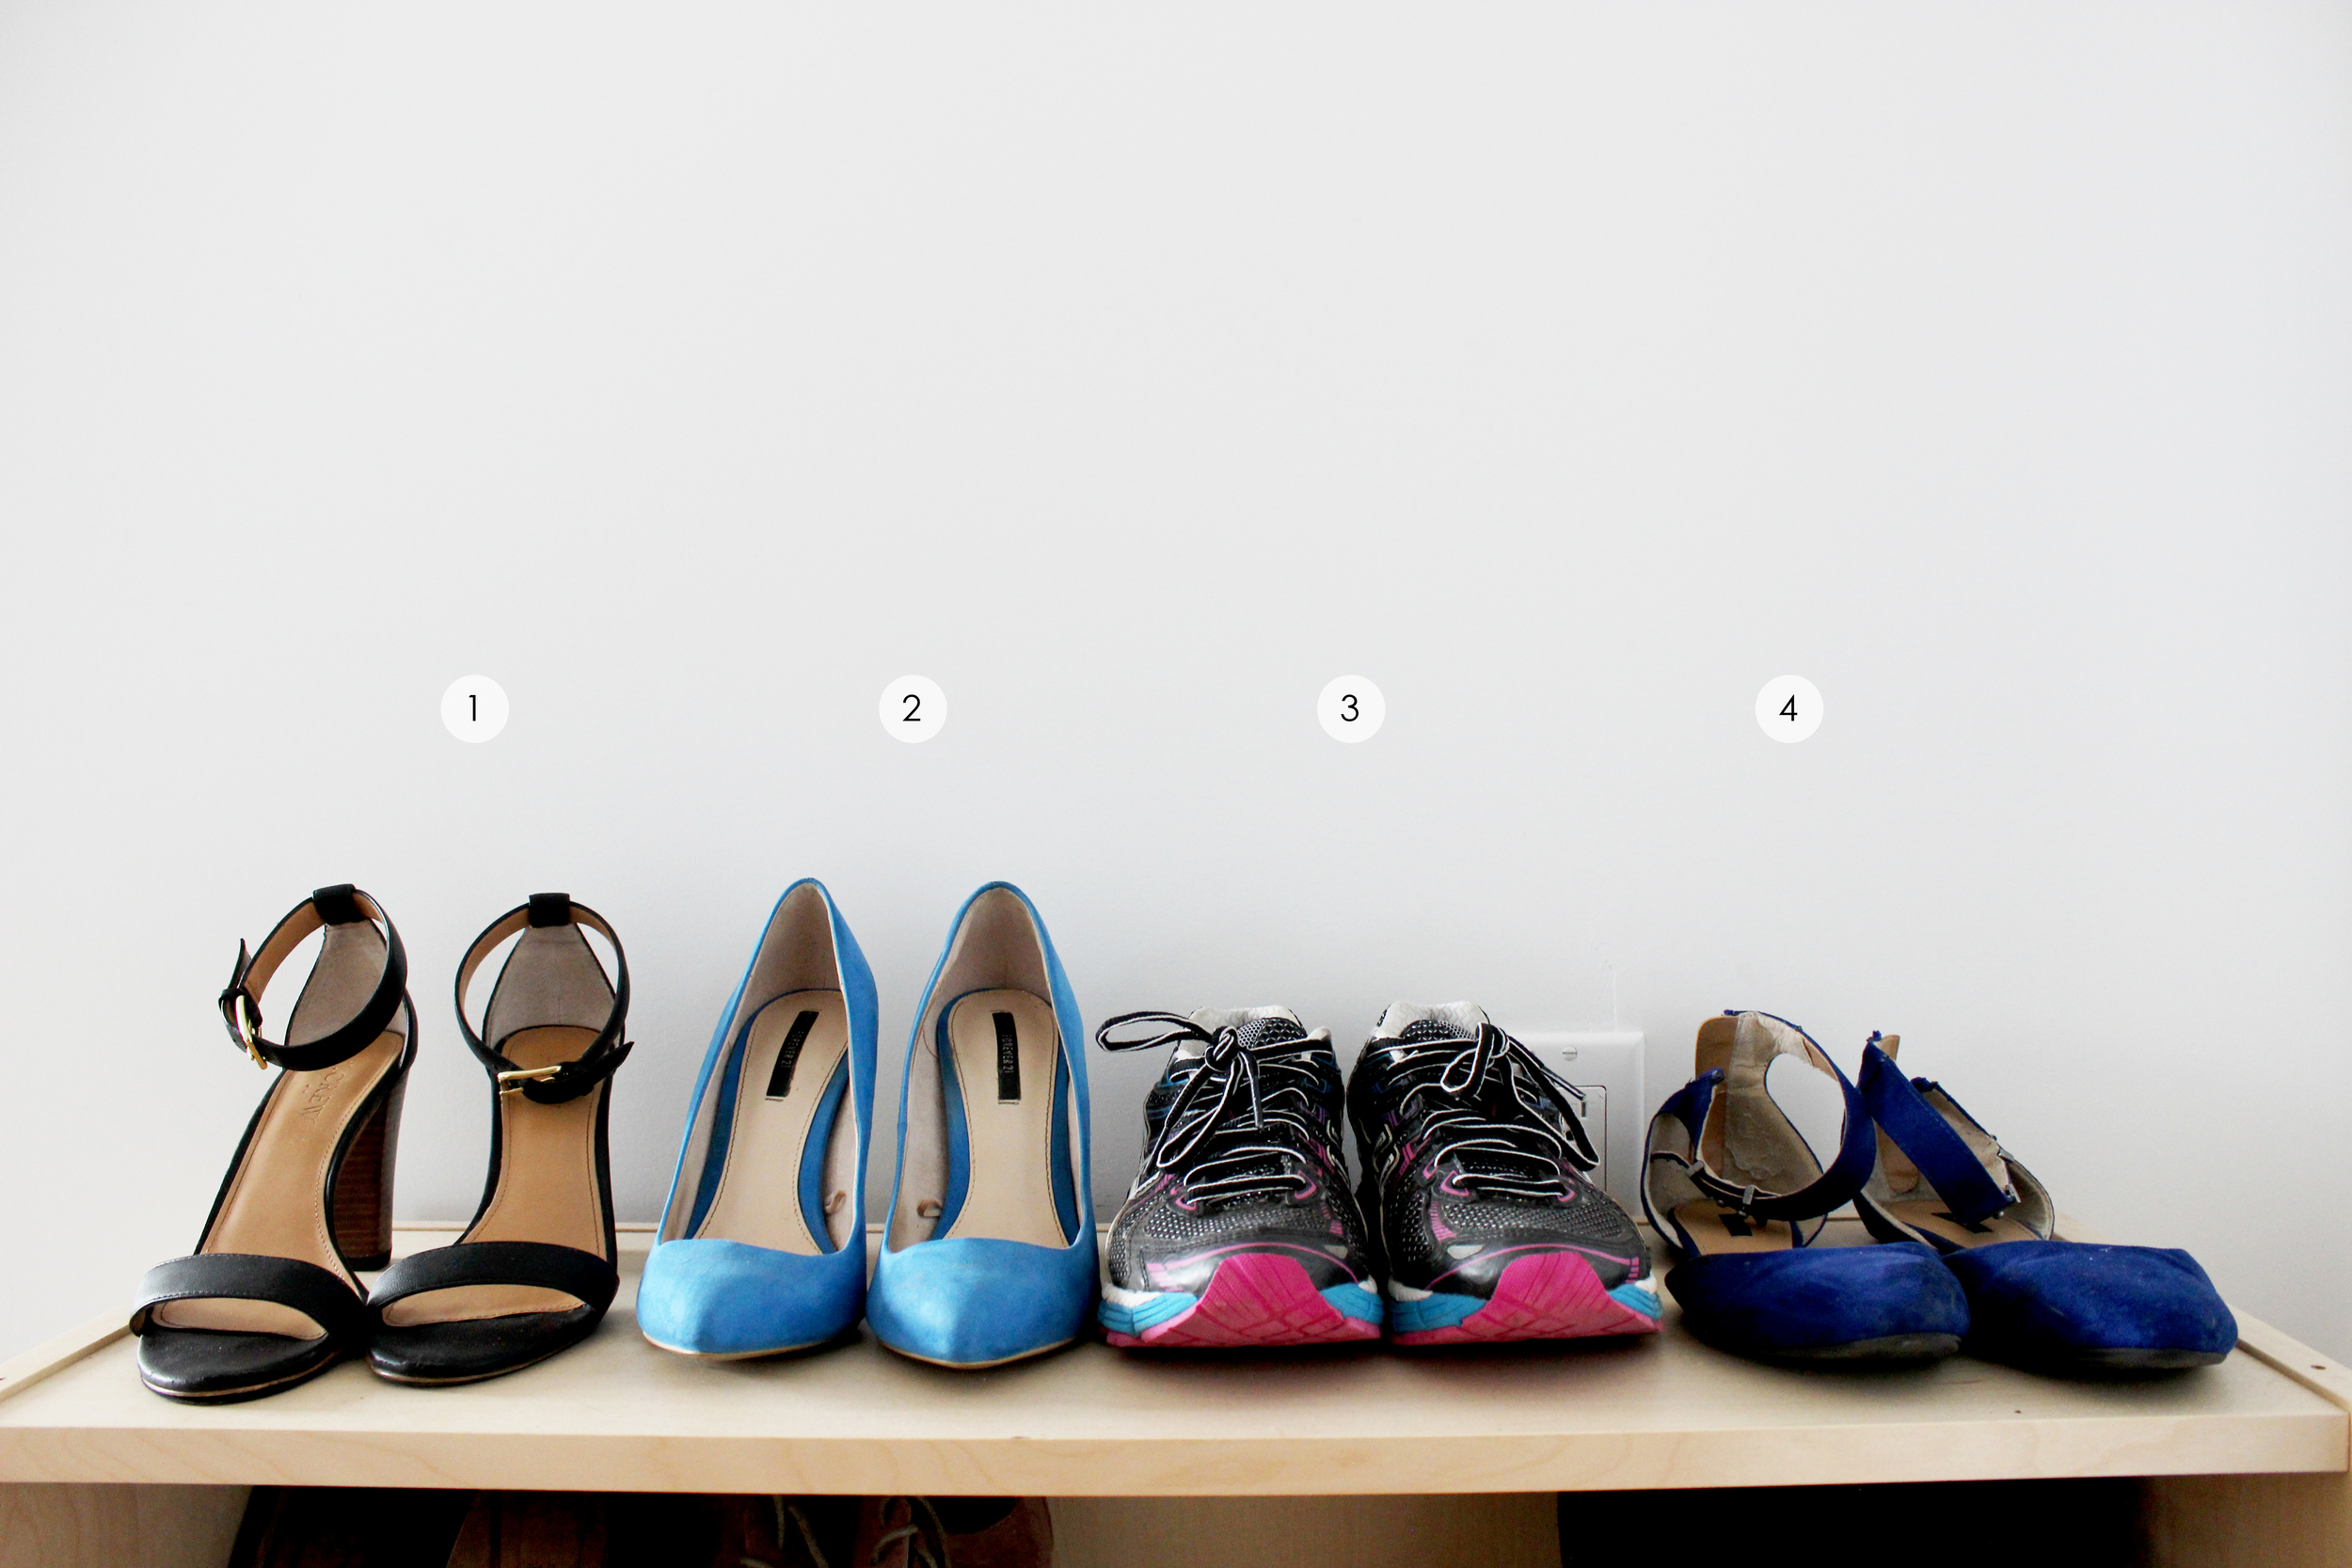 1. Simple black heels ( Jcrew , old) 2. Blue pumps ( Forever21 , old) 3. Running shoes ( Asics ) 4. Flats ( Forever21 , old)